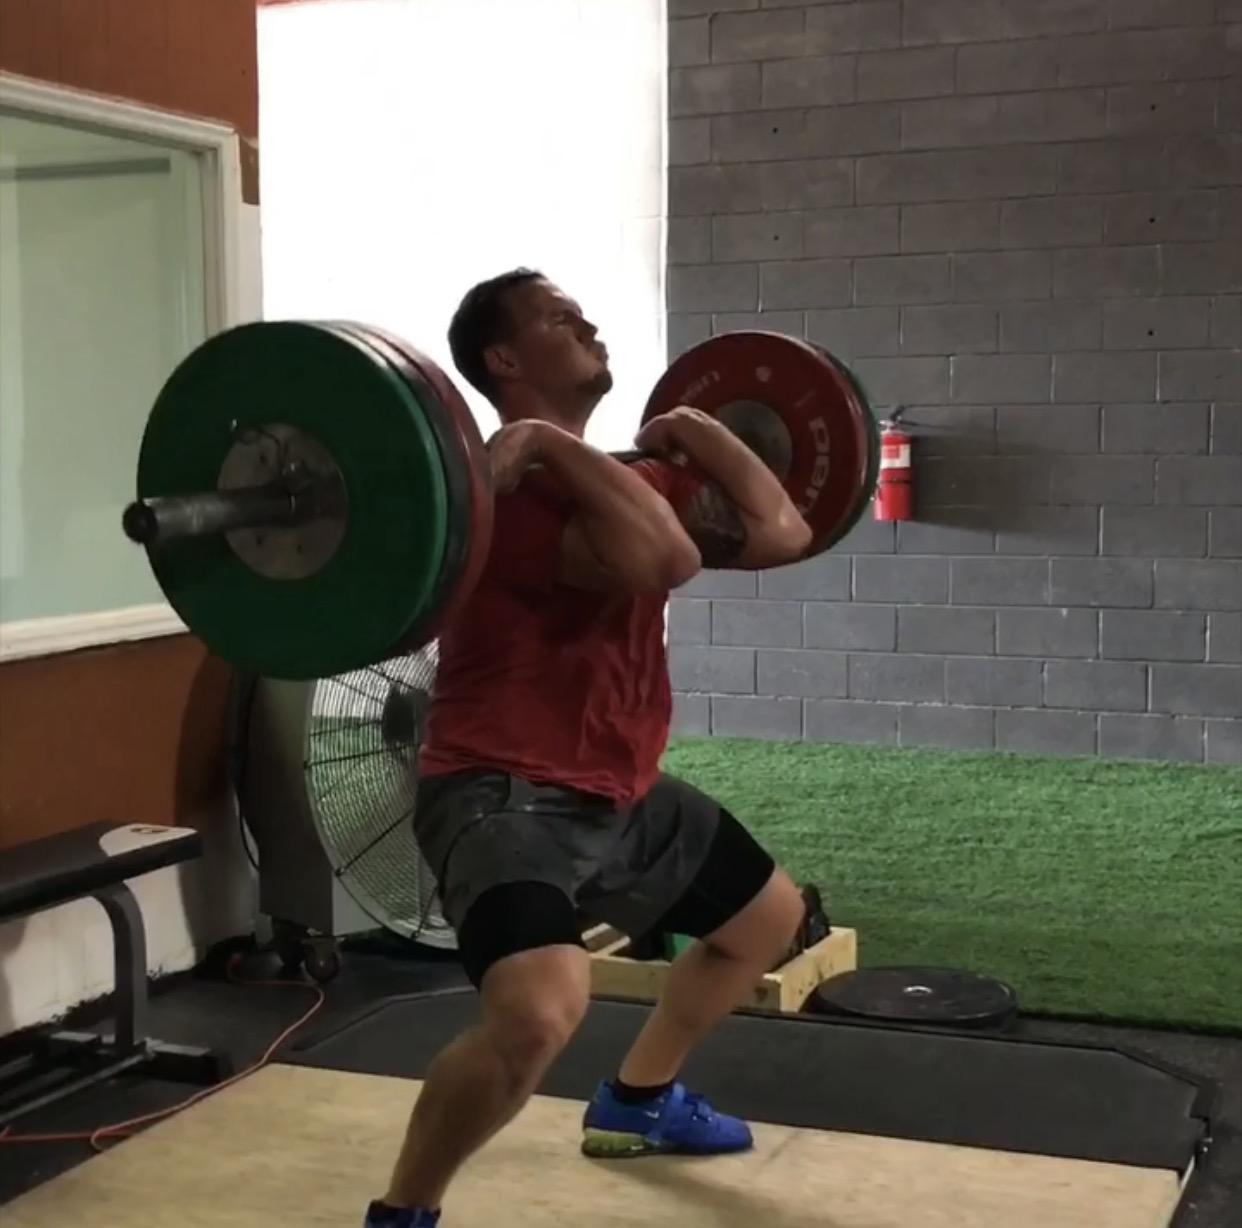 Jeremy S.- CrossFit - Before 1st AttemptSnatch: 200lbsClean and Jerk: 240lbsClean: 260lbsWith 1st AttemptSnatch: 225lbsClean and Jerk: 285lbsClean: 295lbs